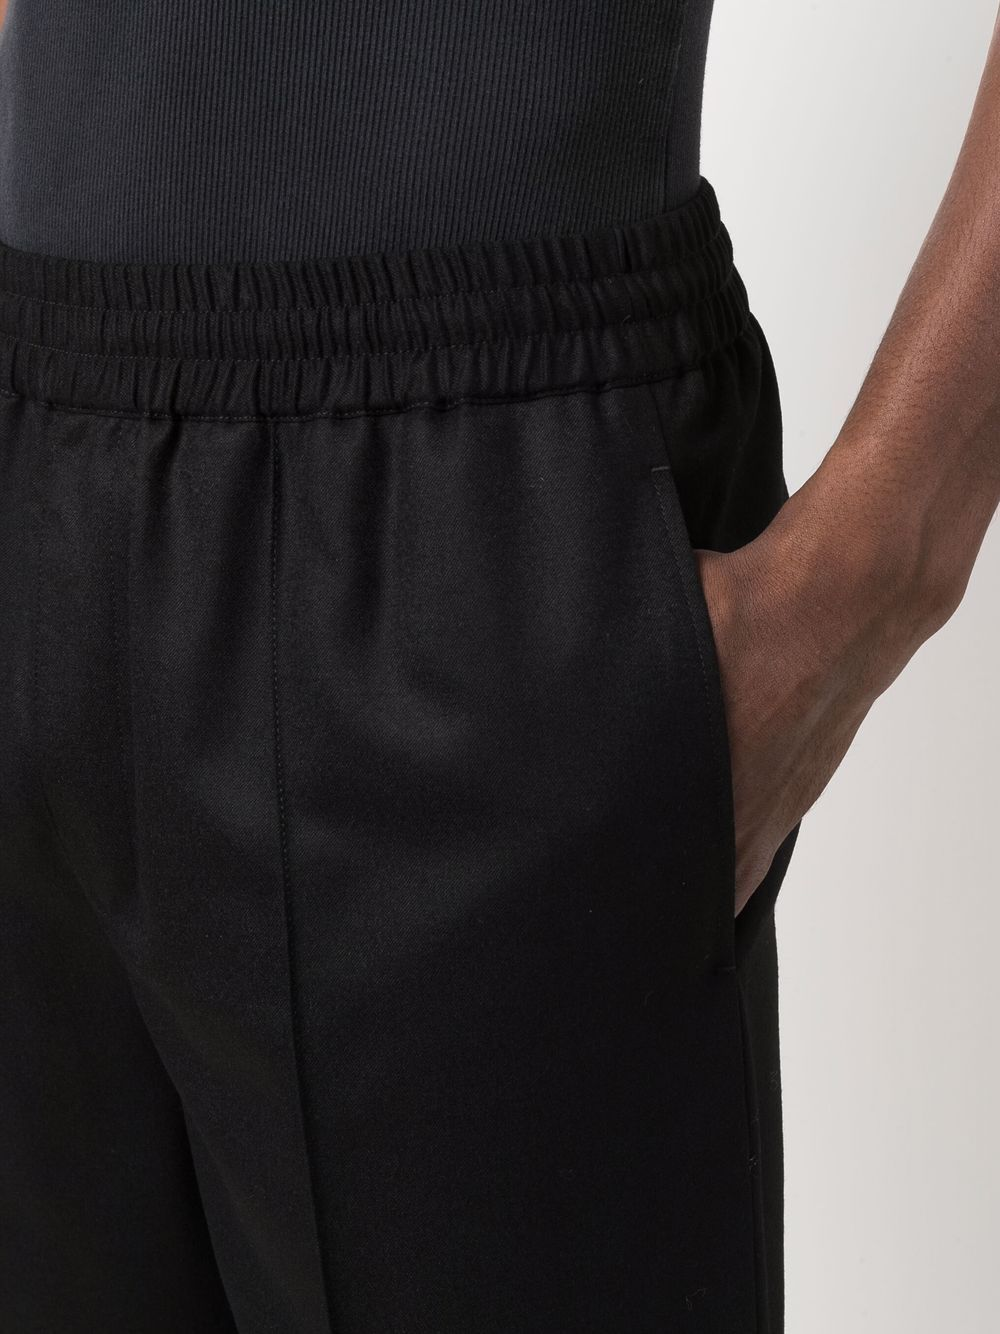 pant pieter man black in wool A.P.C.   Trousers   WVBAG-H08394LZZ